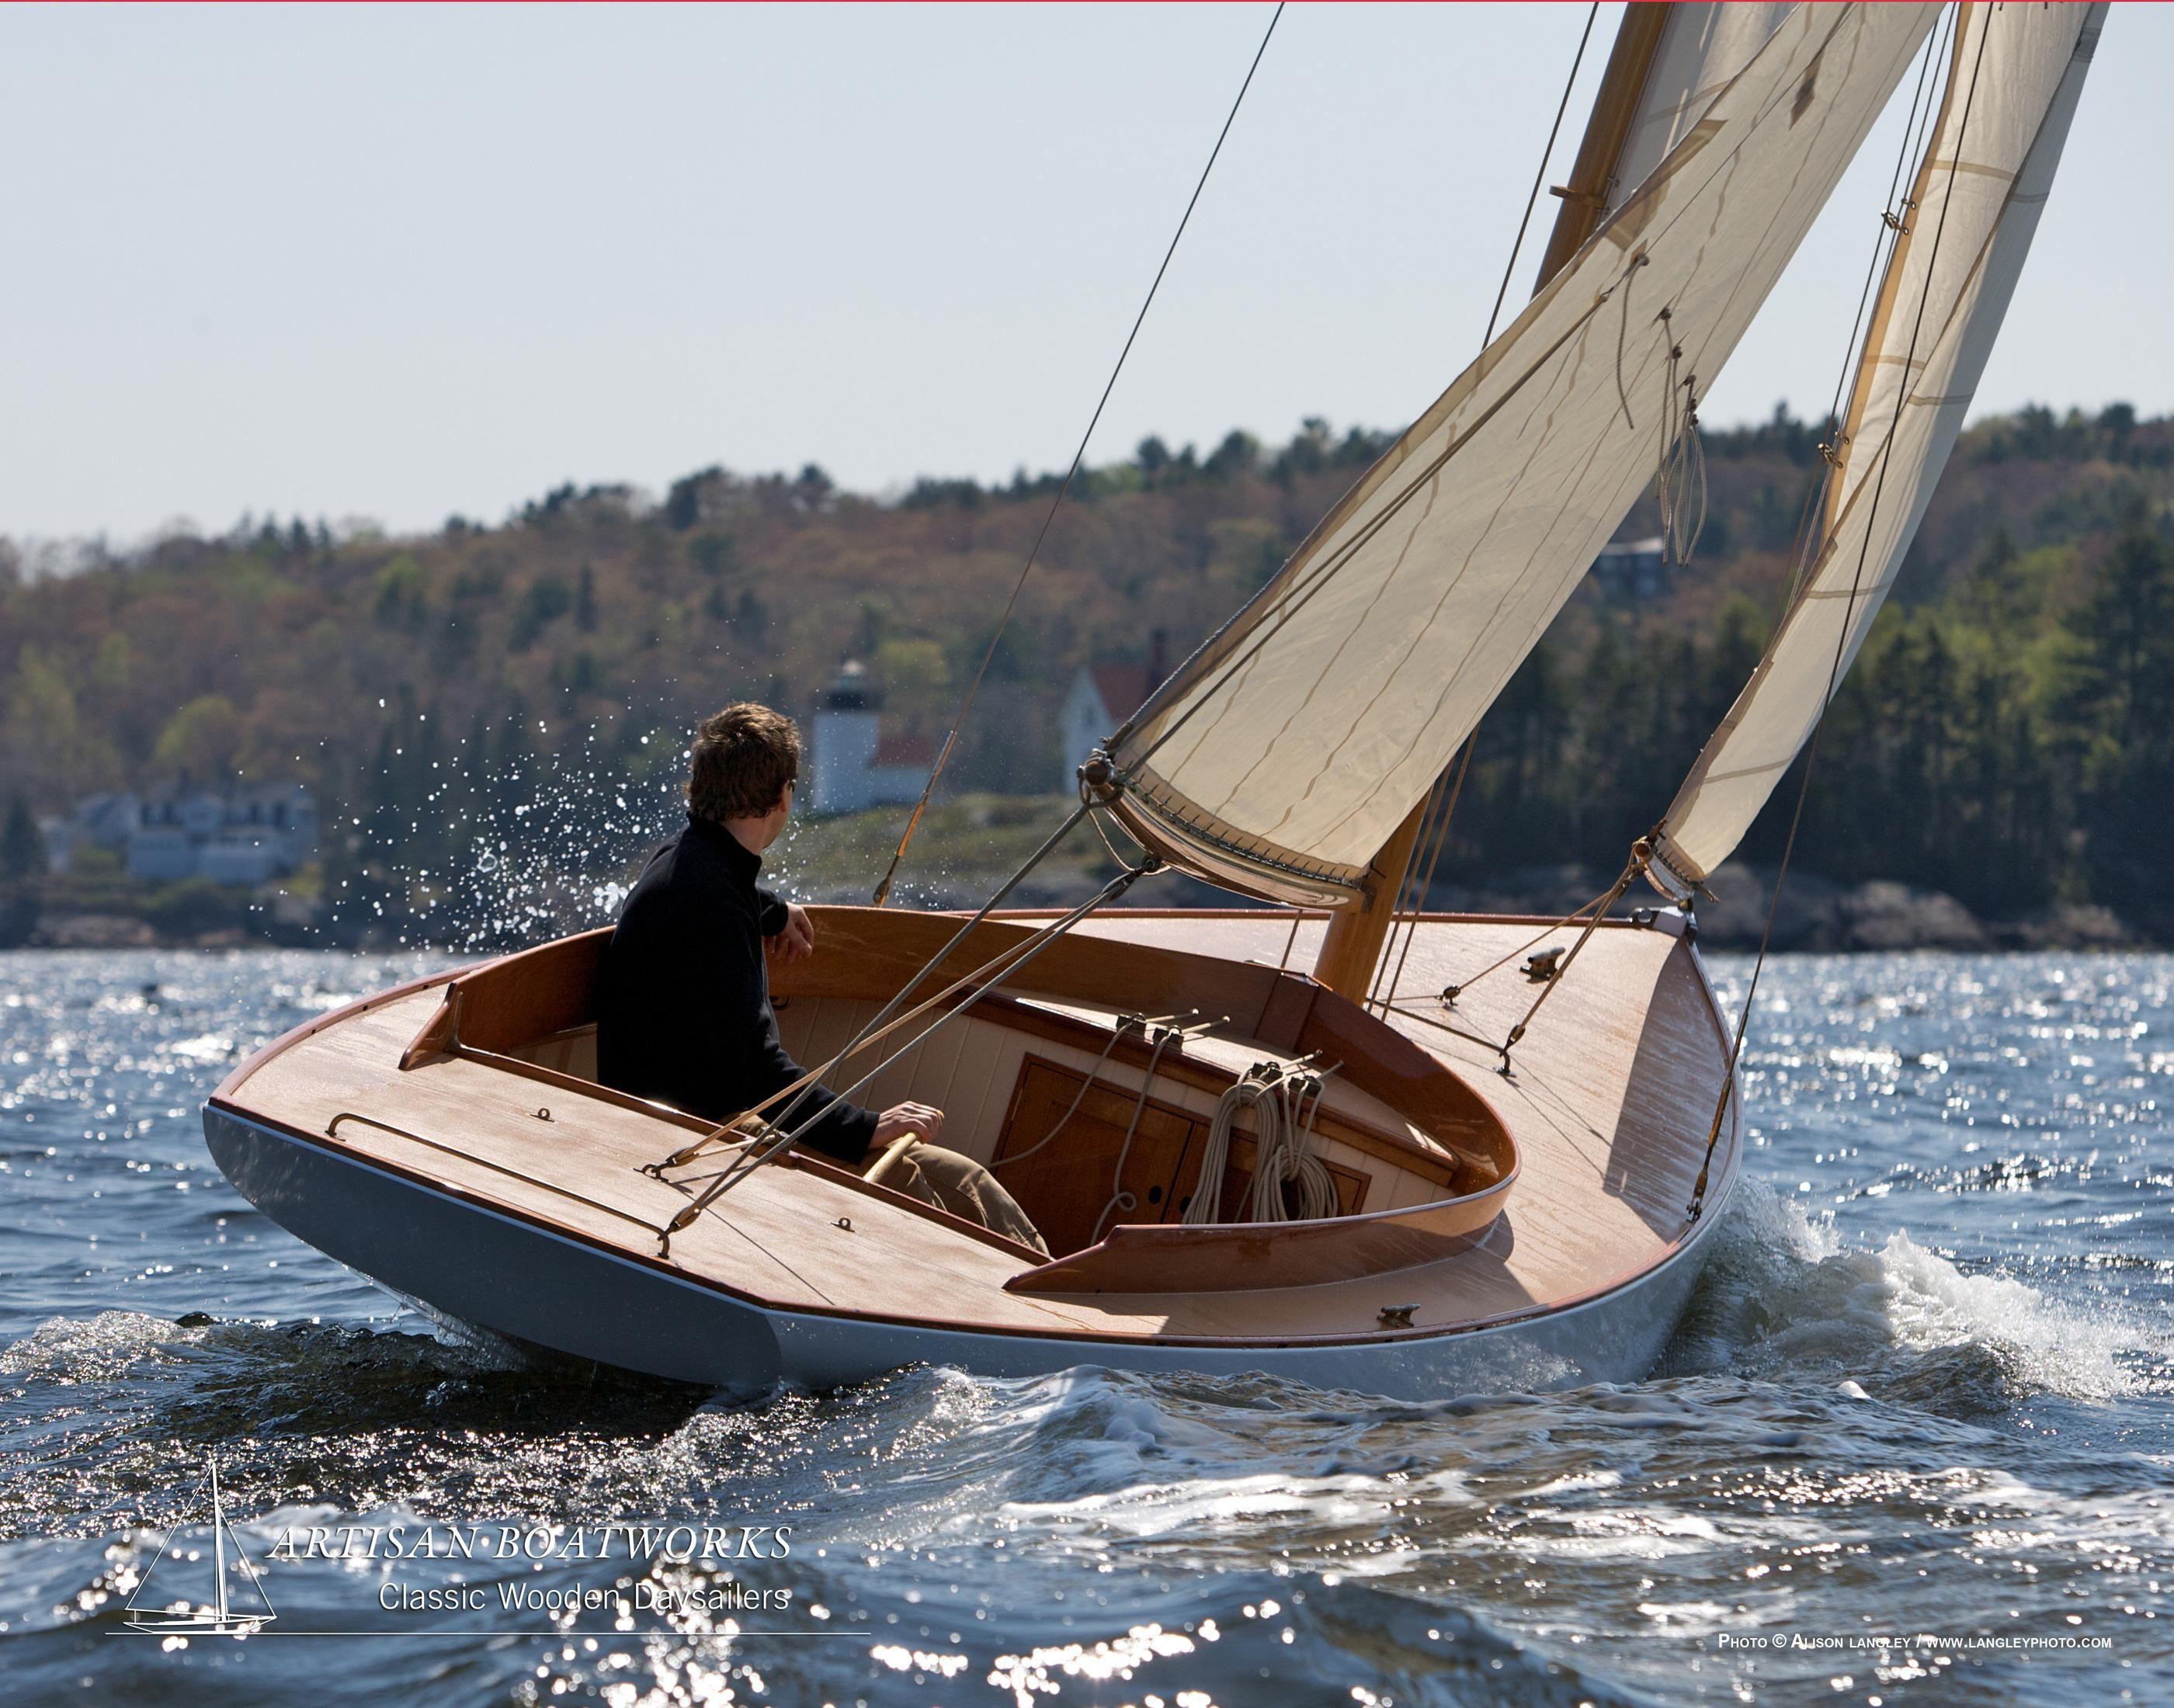 2018 Herreshoff Buzzards Bay 15 Sail Boat For Sale Www